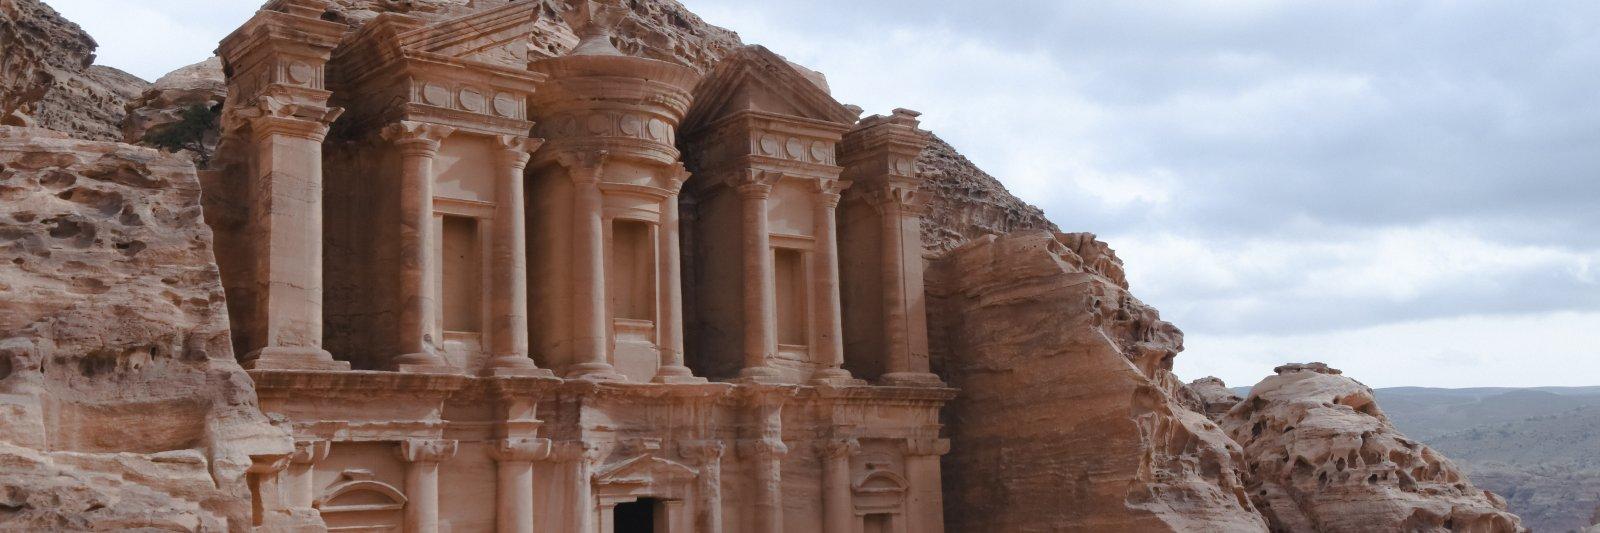 Ancient architecture in Petra, Jordan